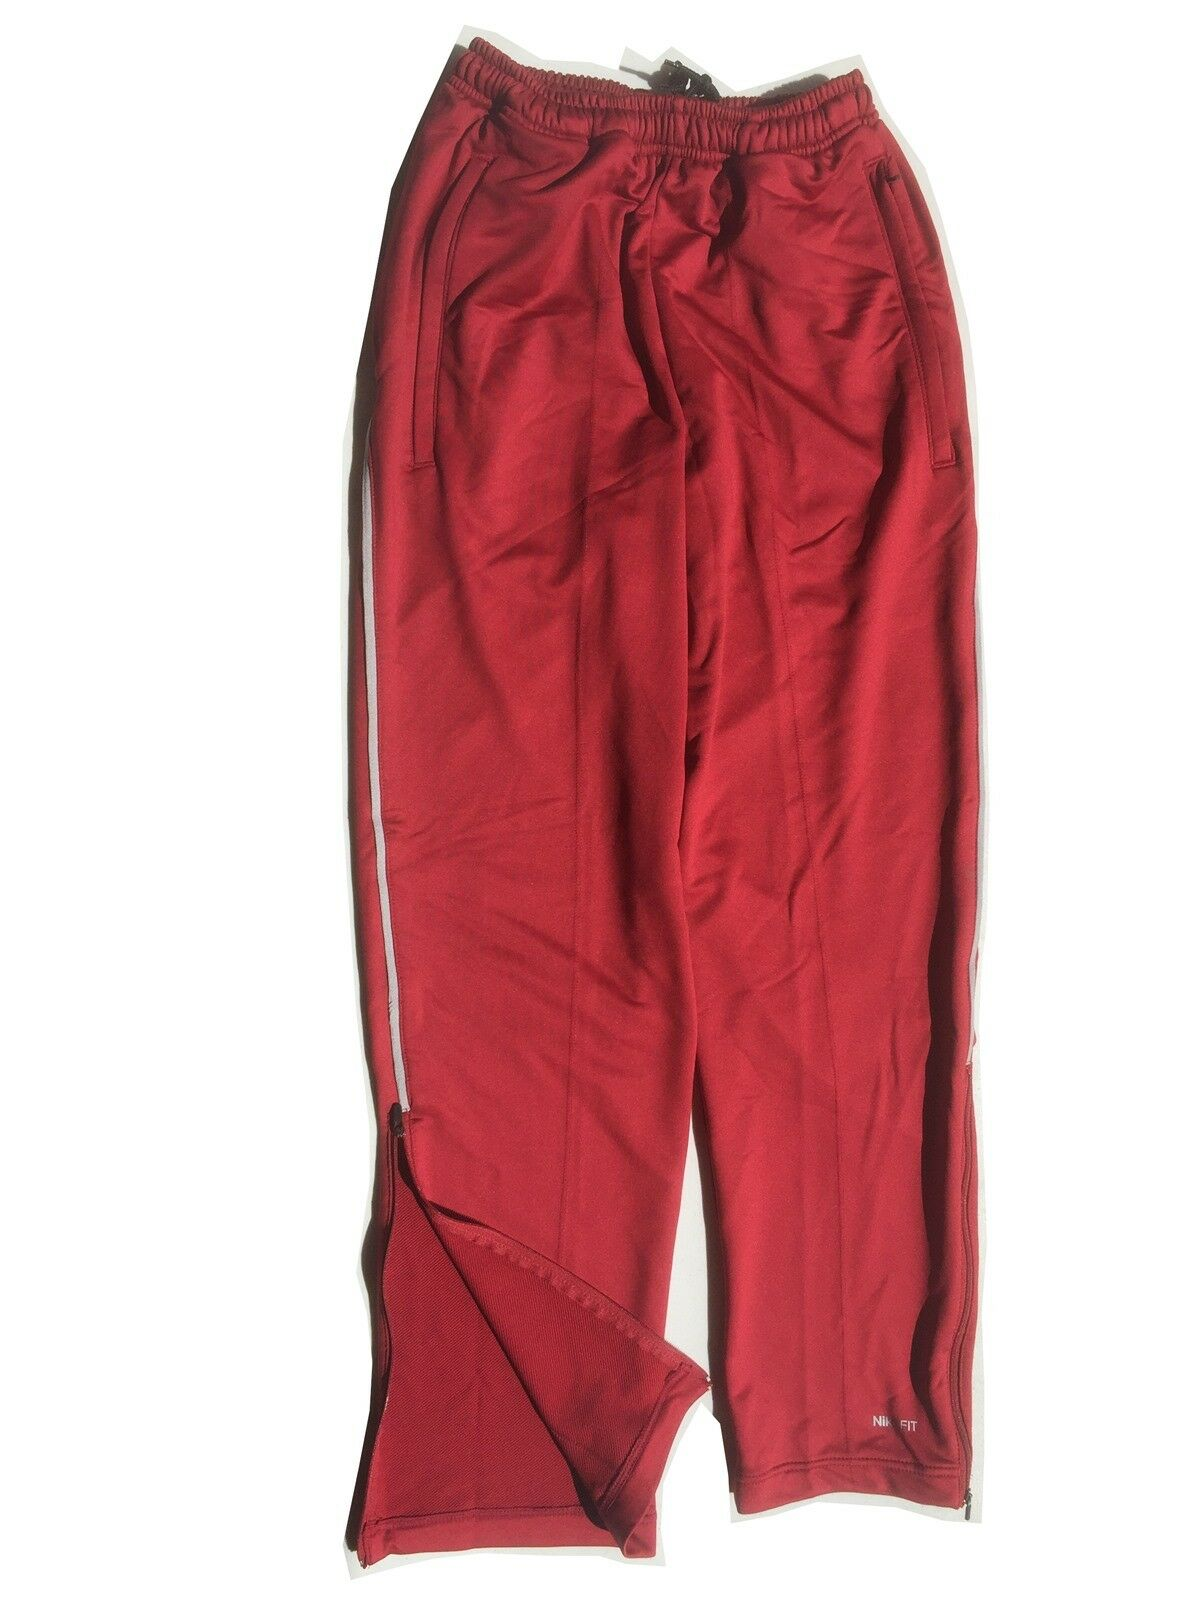 NIKE DRI-FIT Team Issue Basketball Sports Pants Alabama Crimson Tide SZ XSmall